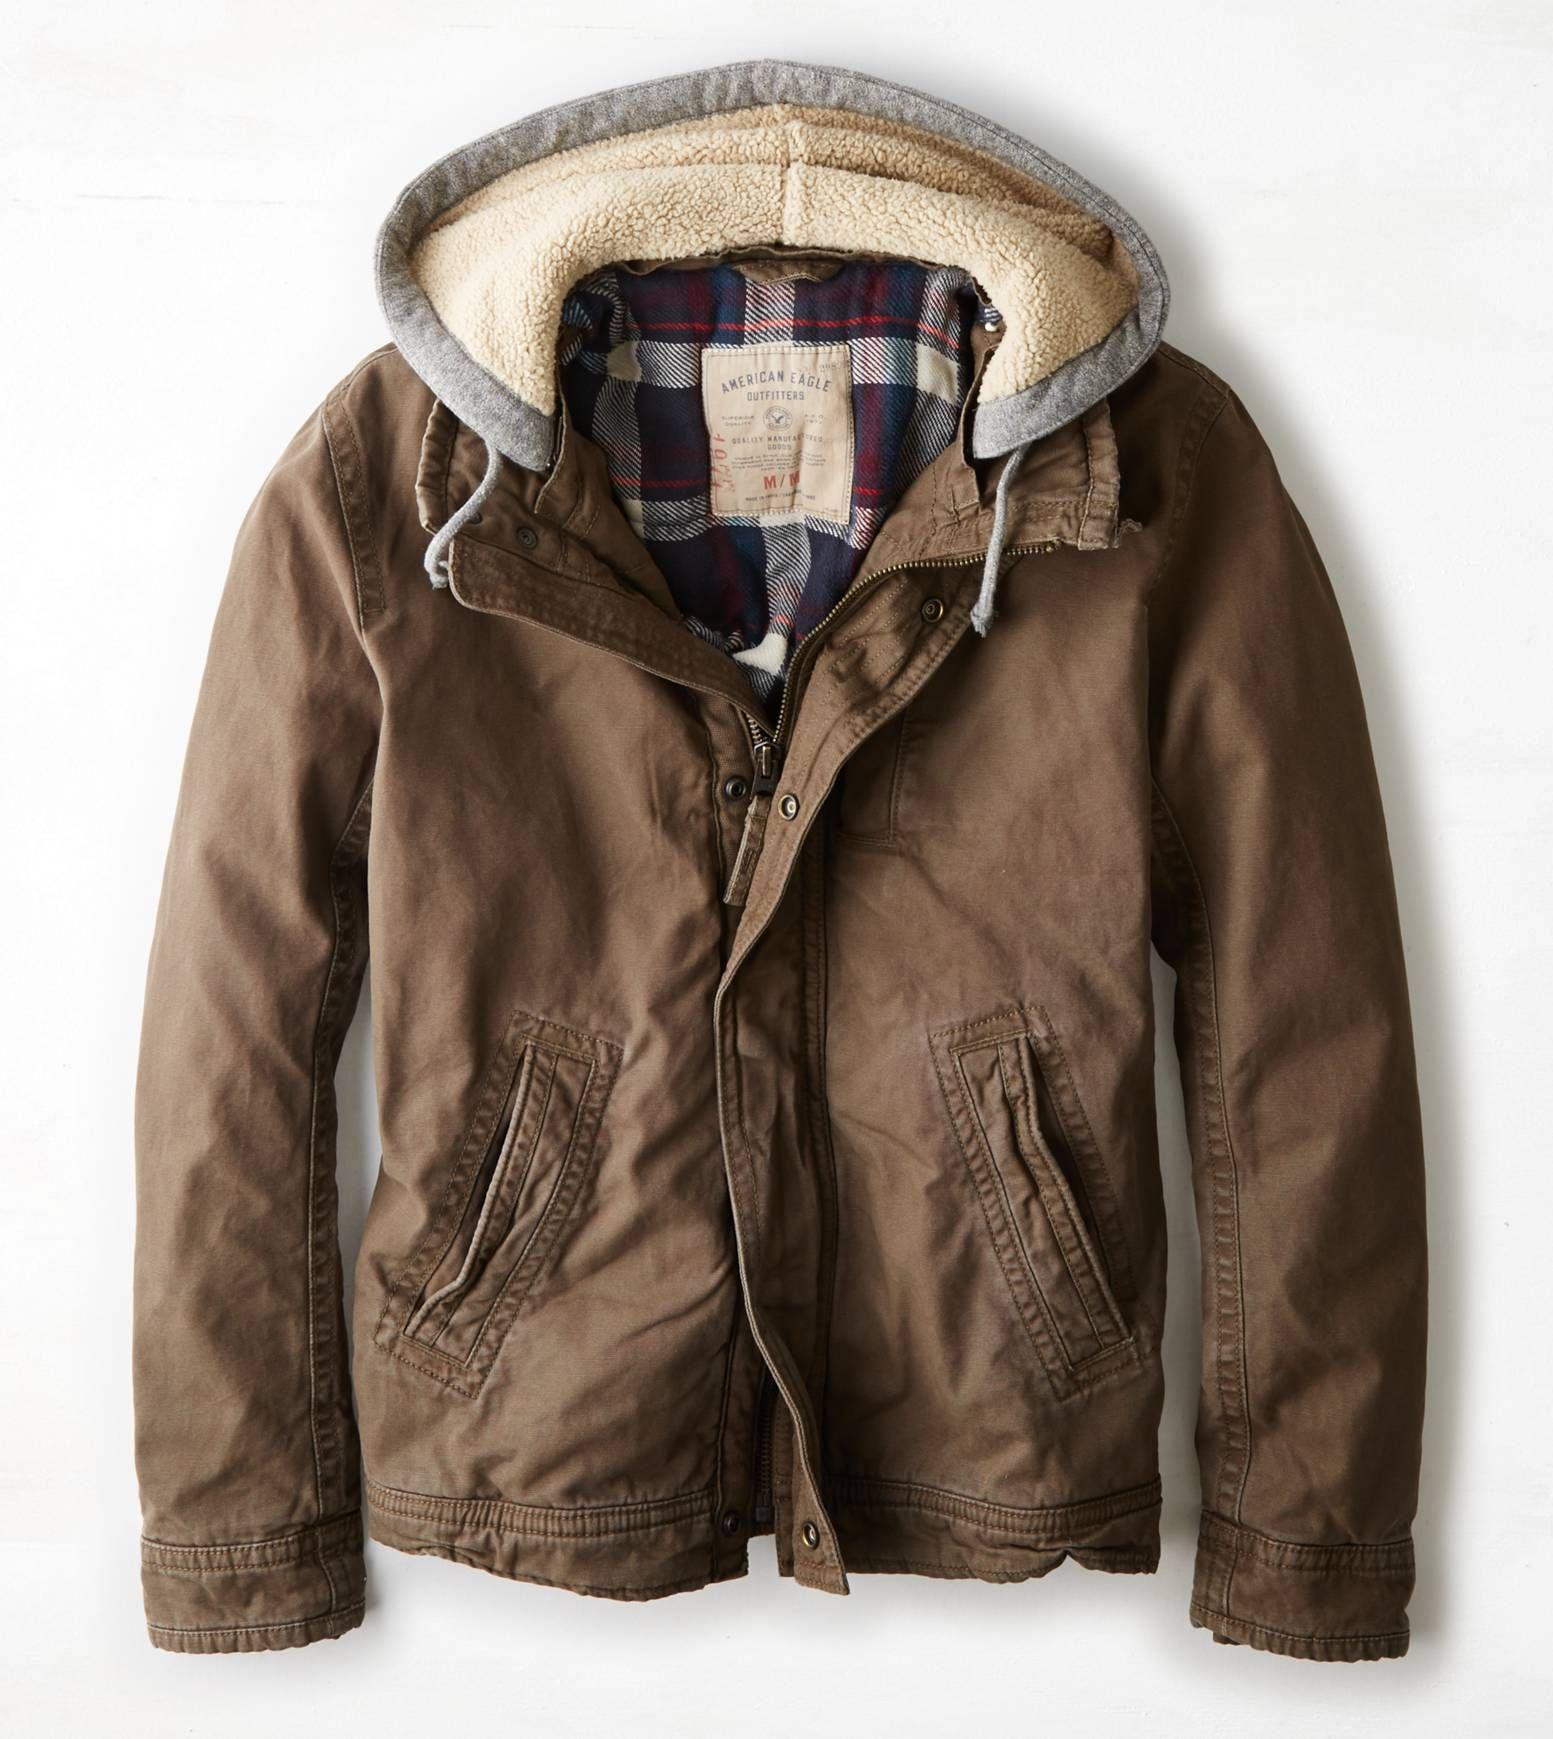 Aeo Vintage Workwear Jacket Tobacco American Eagle Outfitters Mens Outfitters Mens Outfits Lounge Wear Stylish [ 1739 x 1553 Pixel ]